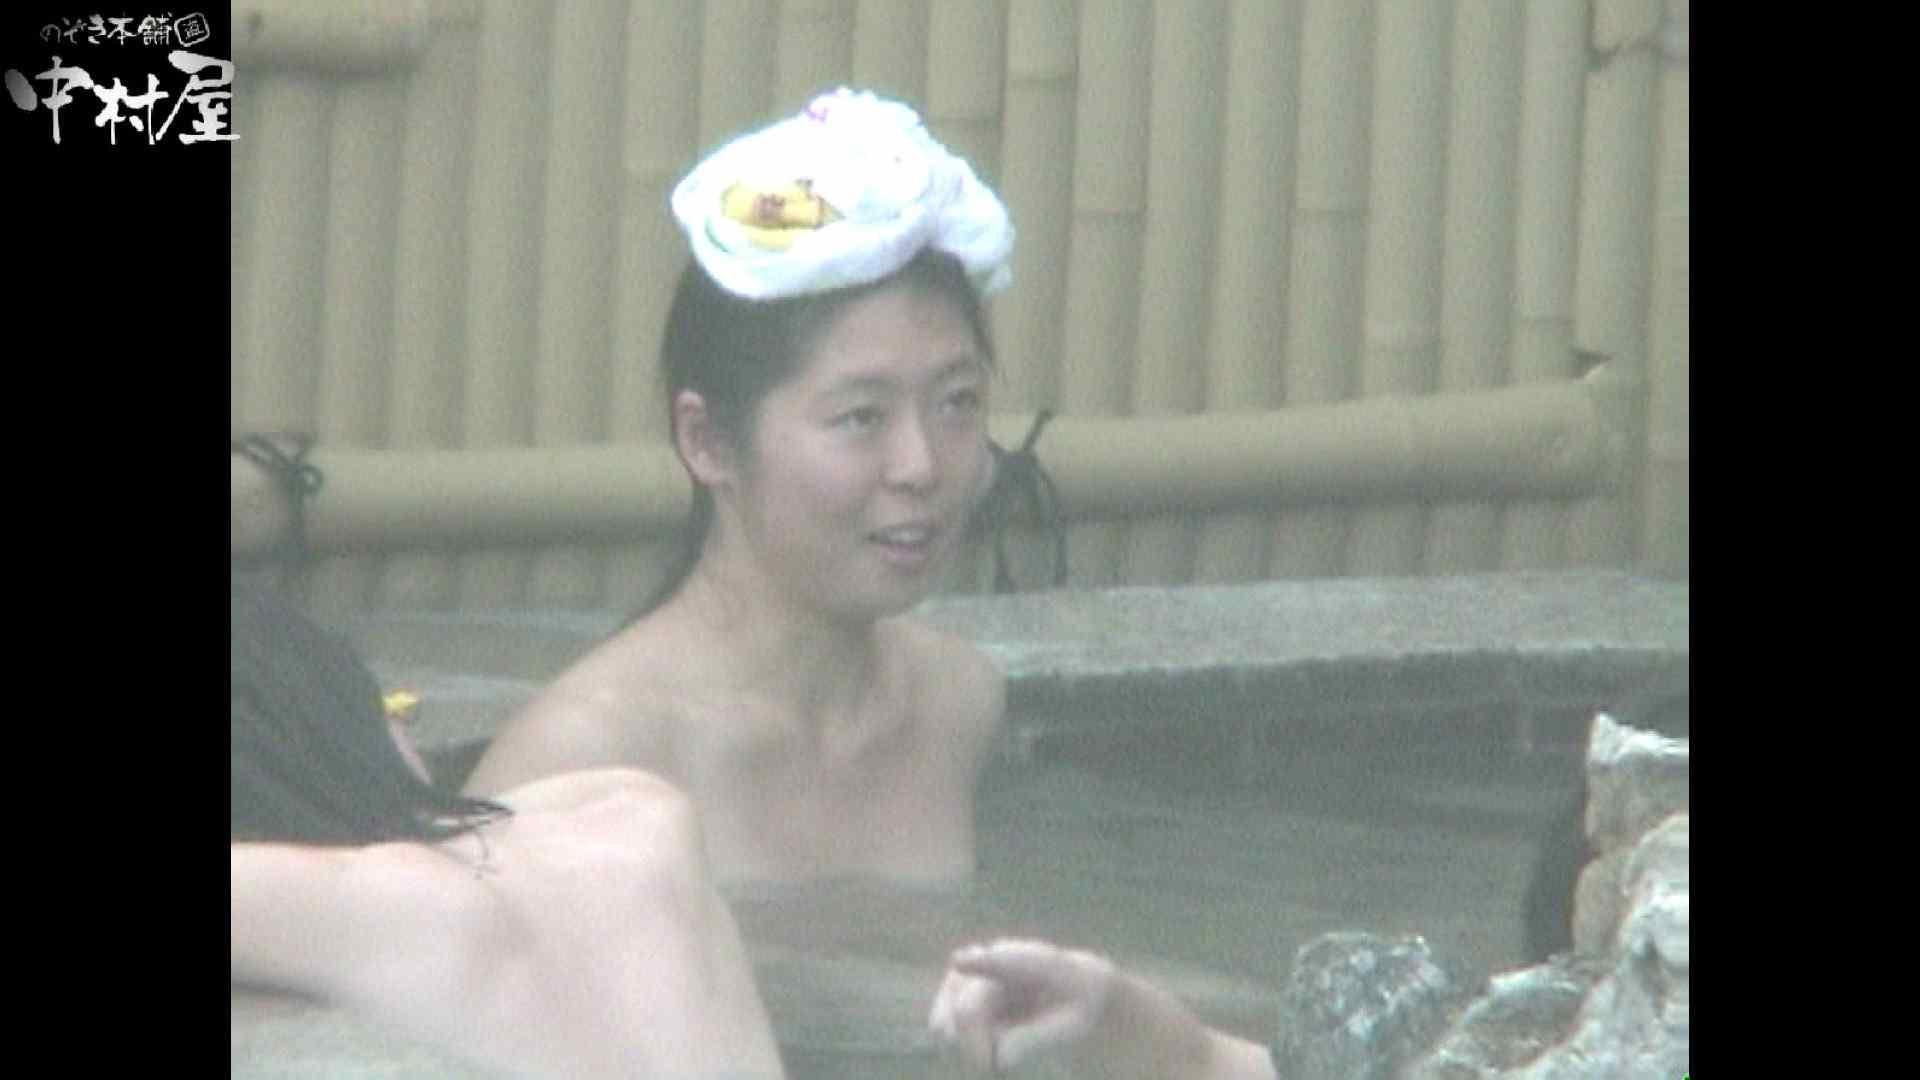 Aquaな露天風呂Vol.932 美しいOLの裸体 おまんこ無修正動画無料 106pic 41